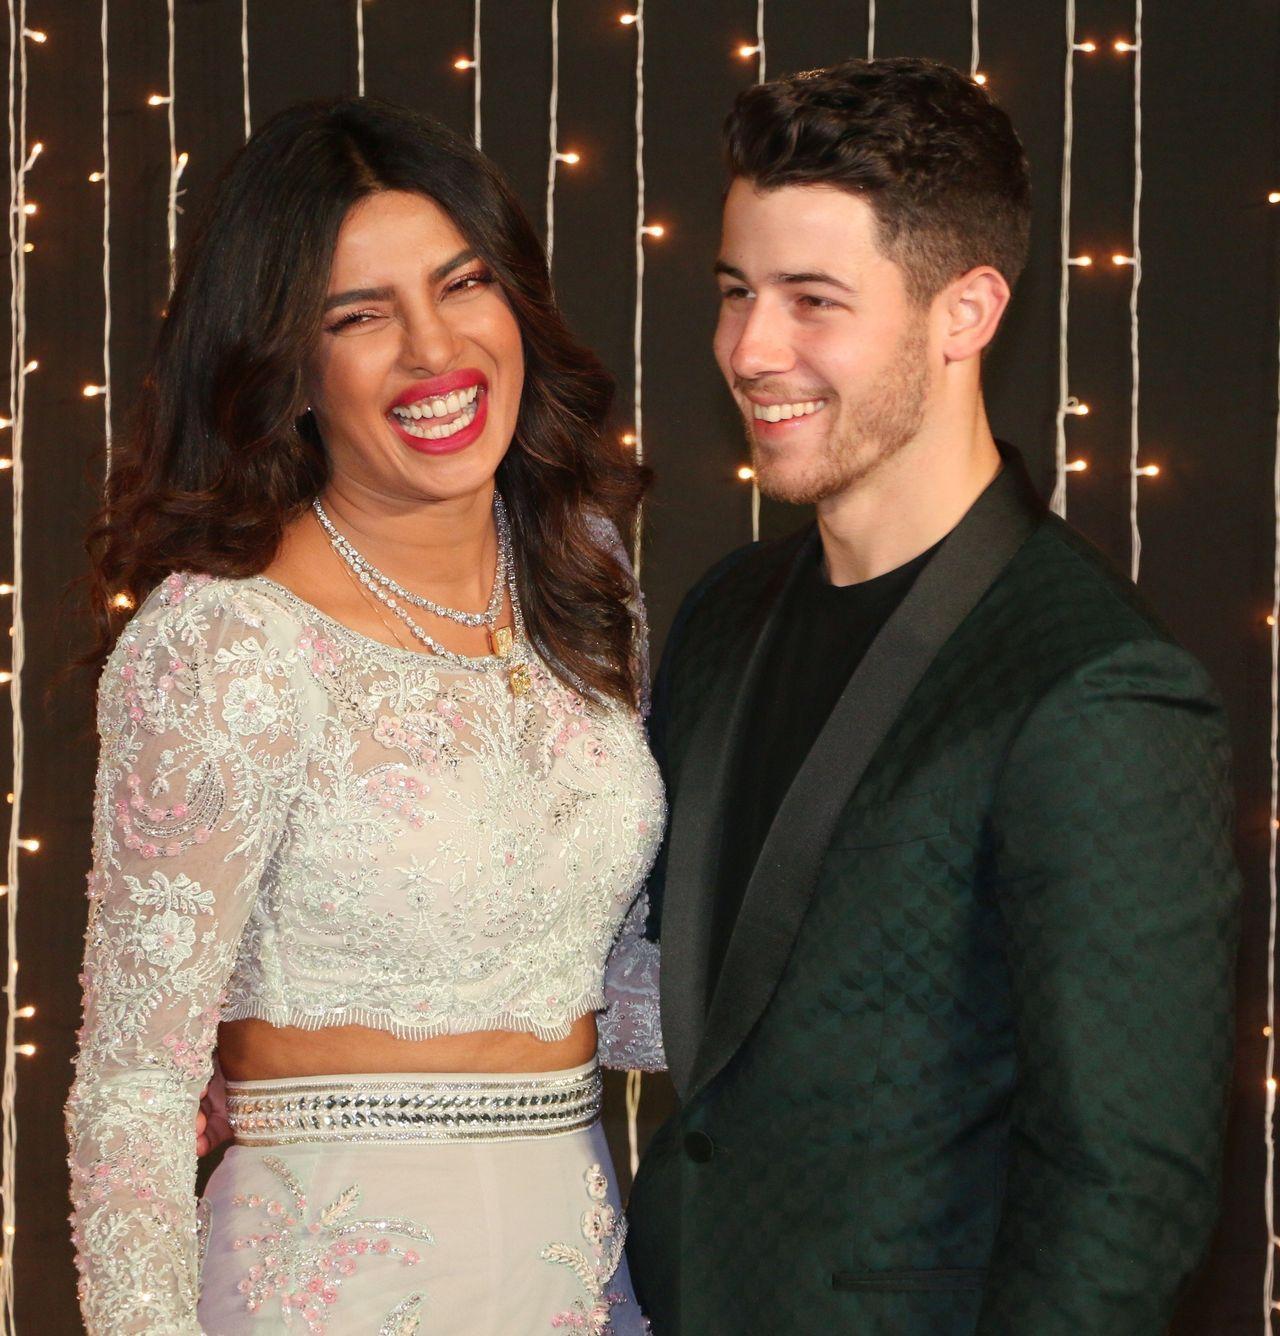 Priyanka Chopra and Nick Jonas continue glamorous wedding celebrations with a third Reception in Mumbai / Zed Jameson / BACKGRID , kod: Priyanka Chopra and Nick Jonas